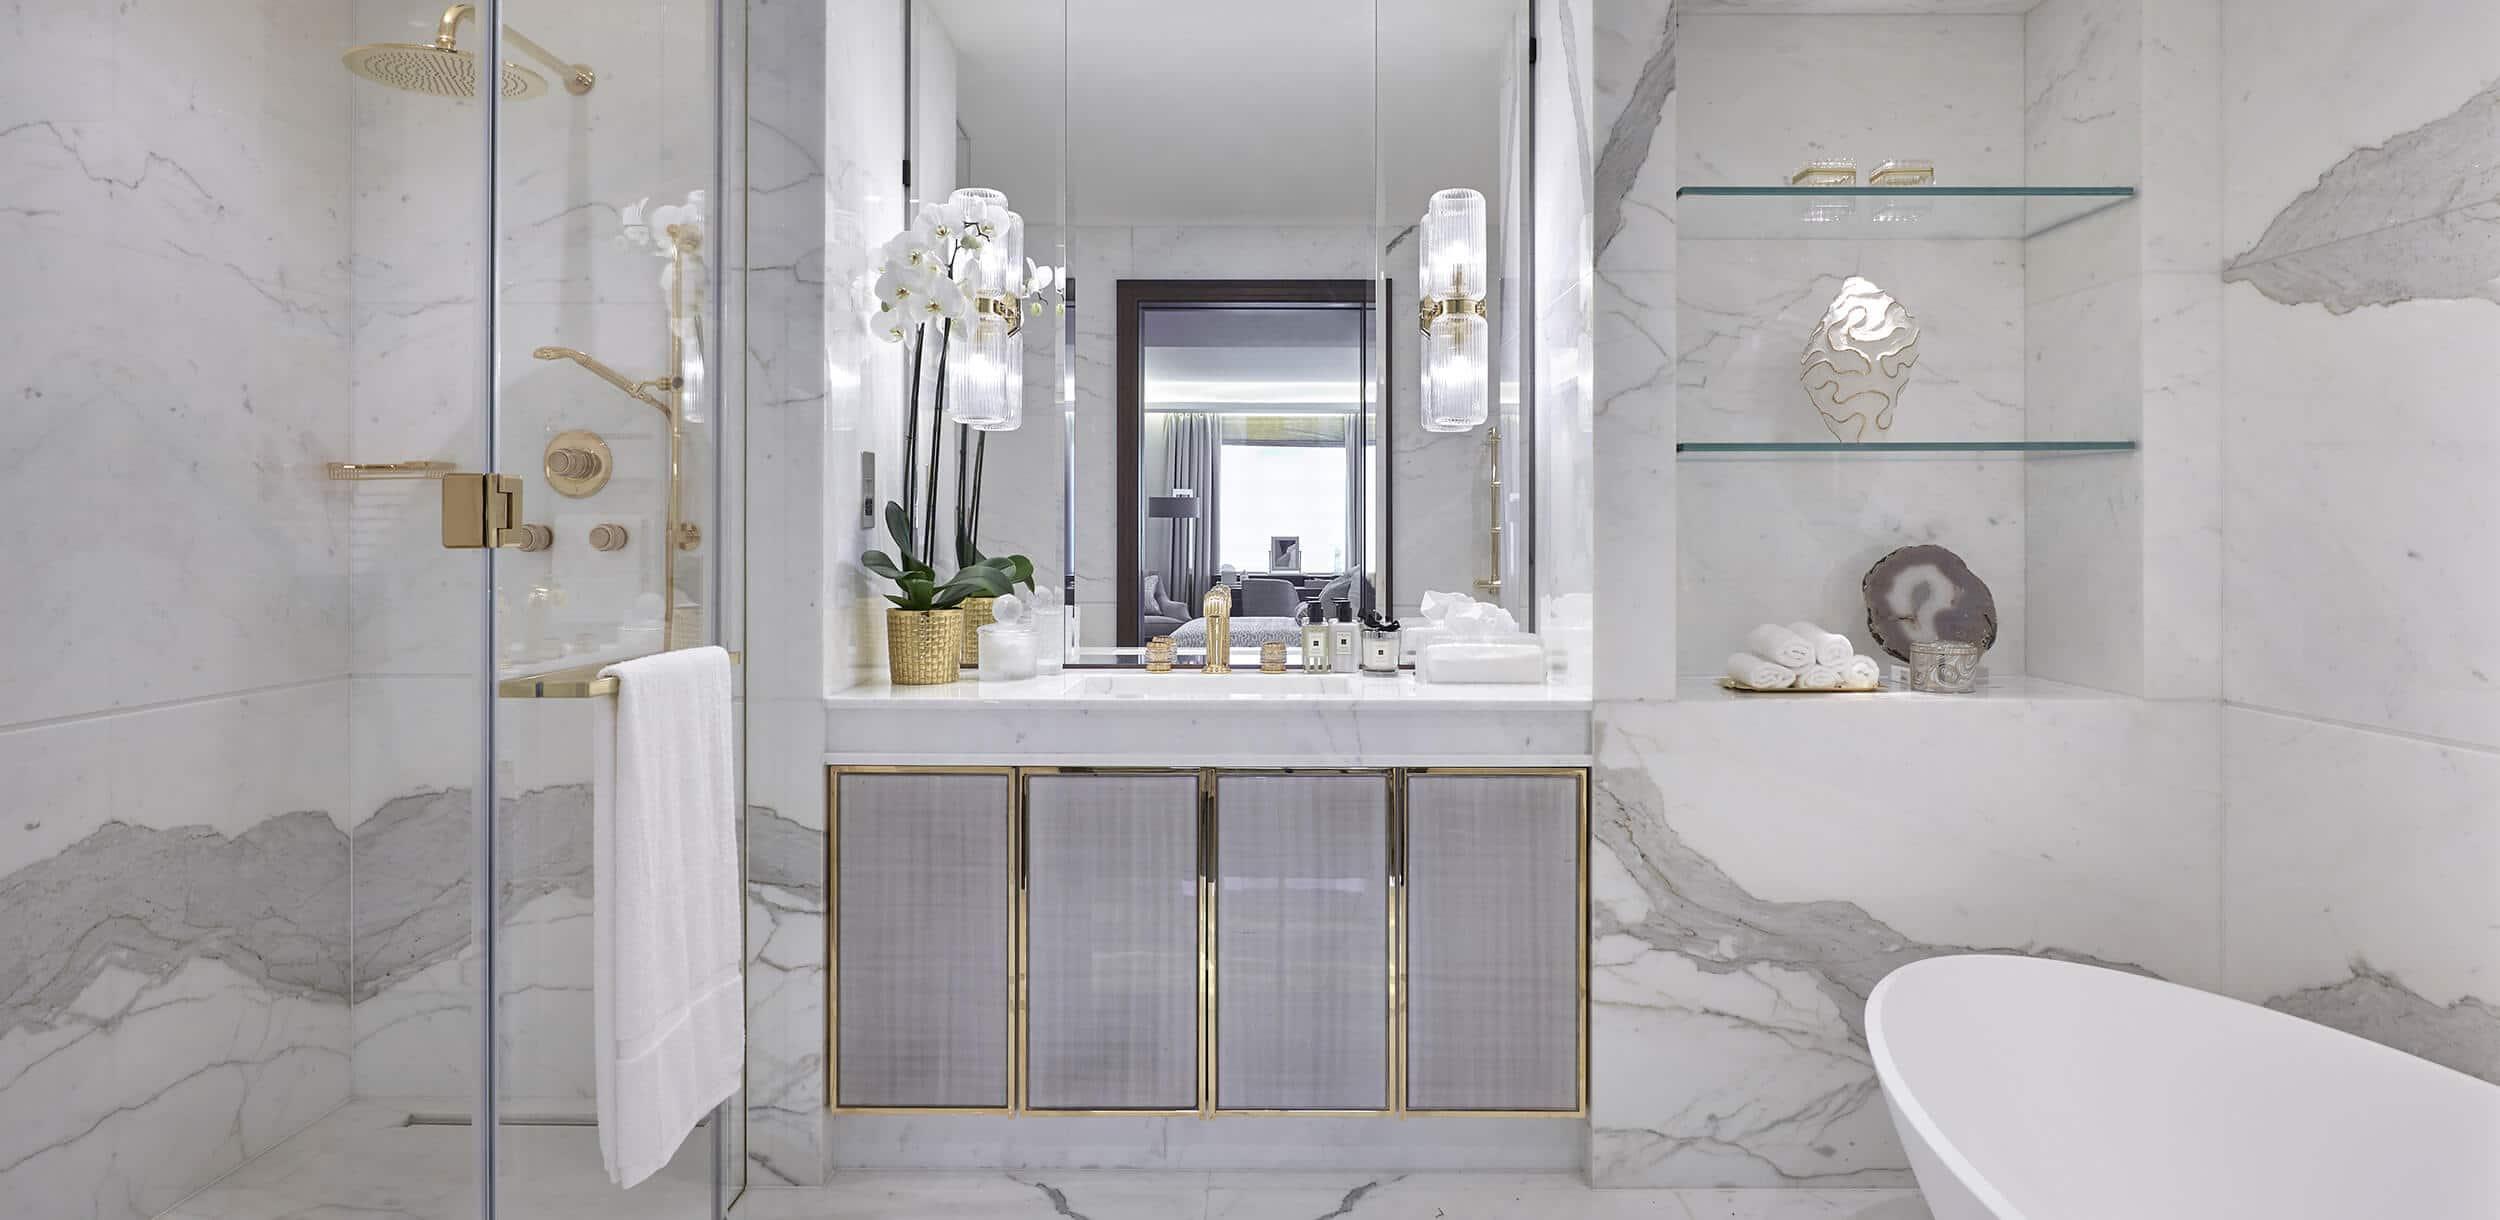 Luxury interior design project hyde park